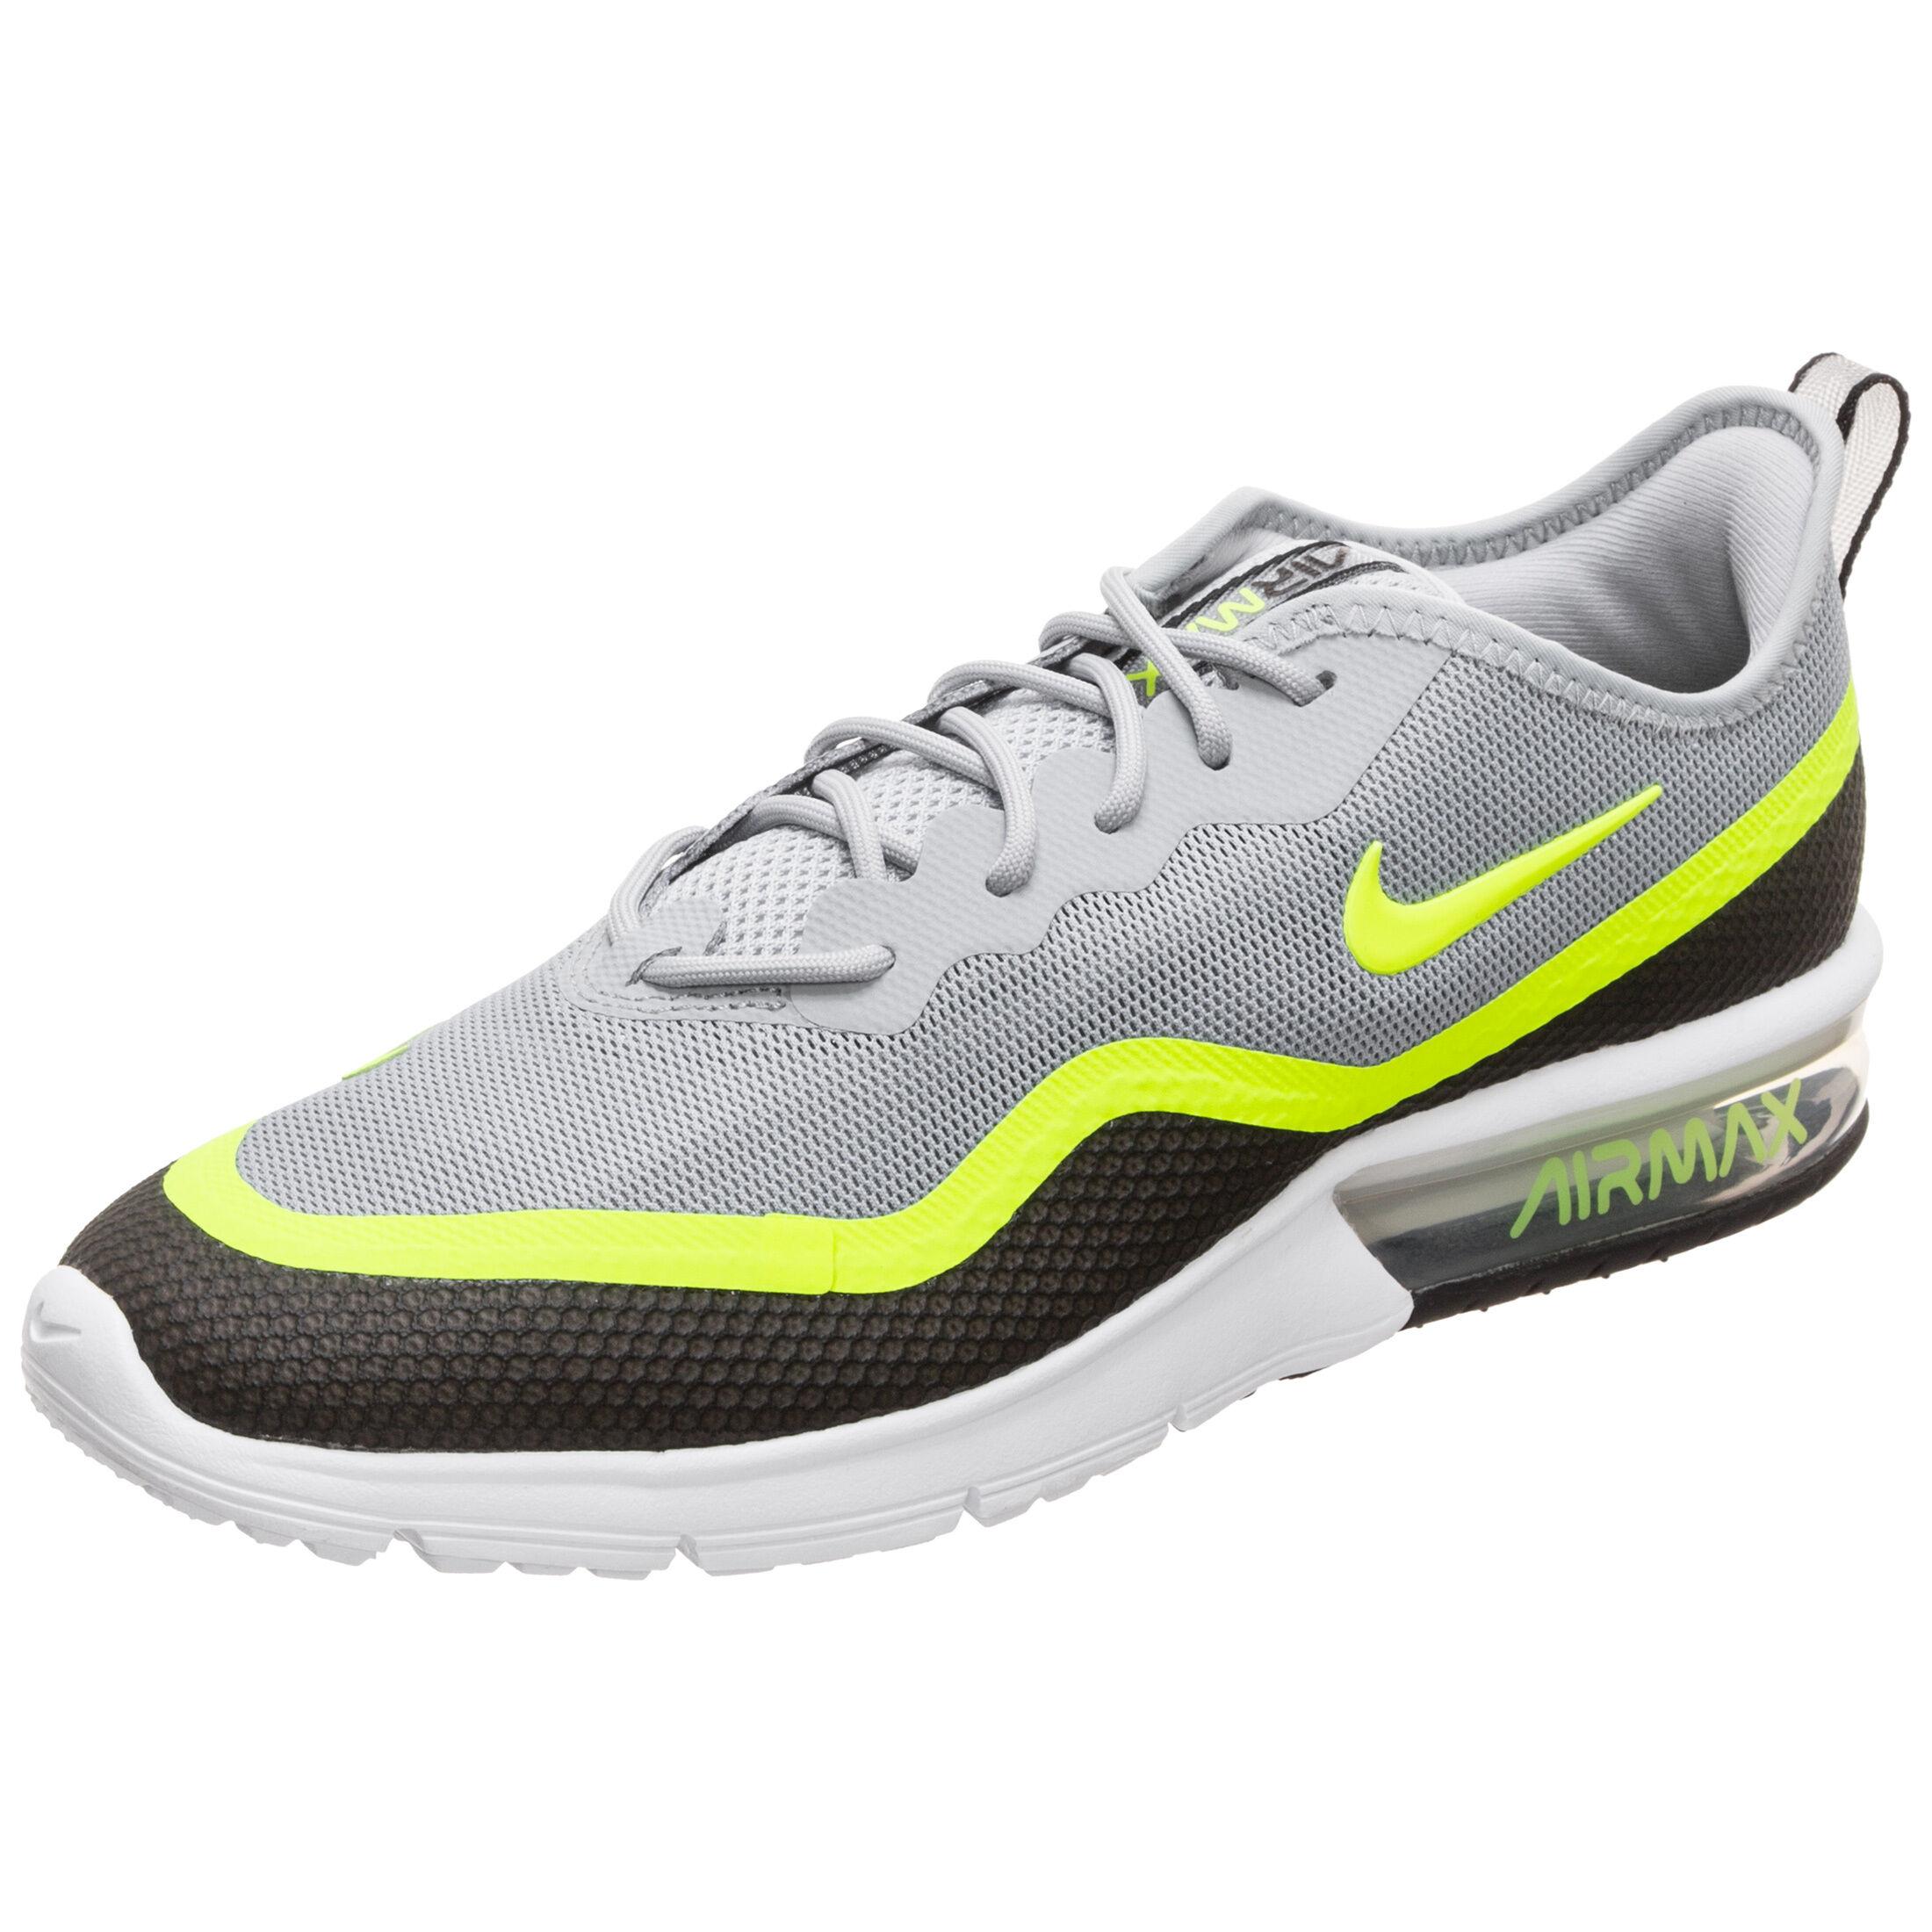 Nike Sportswear Air Max Sequent 4.5 SE Sneaker Herren bei